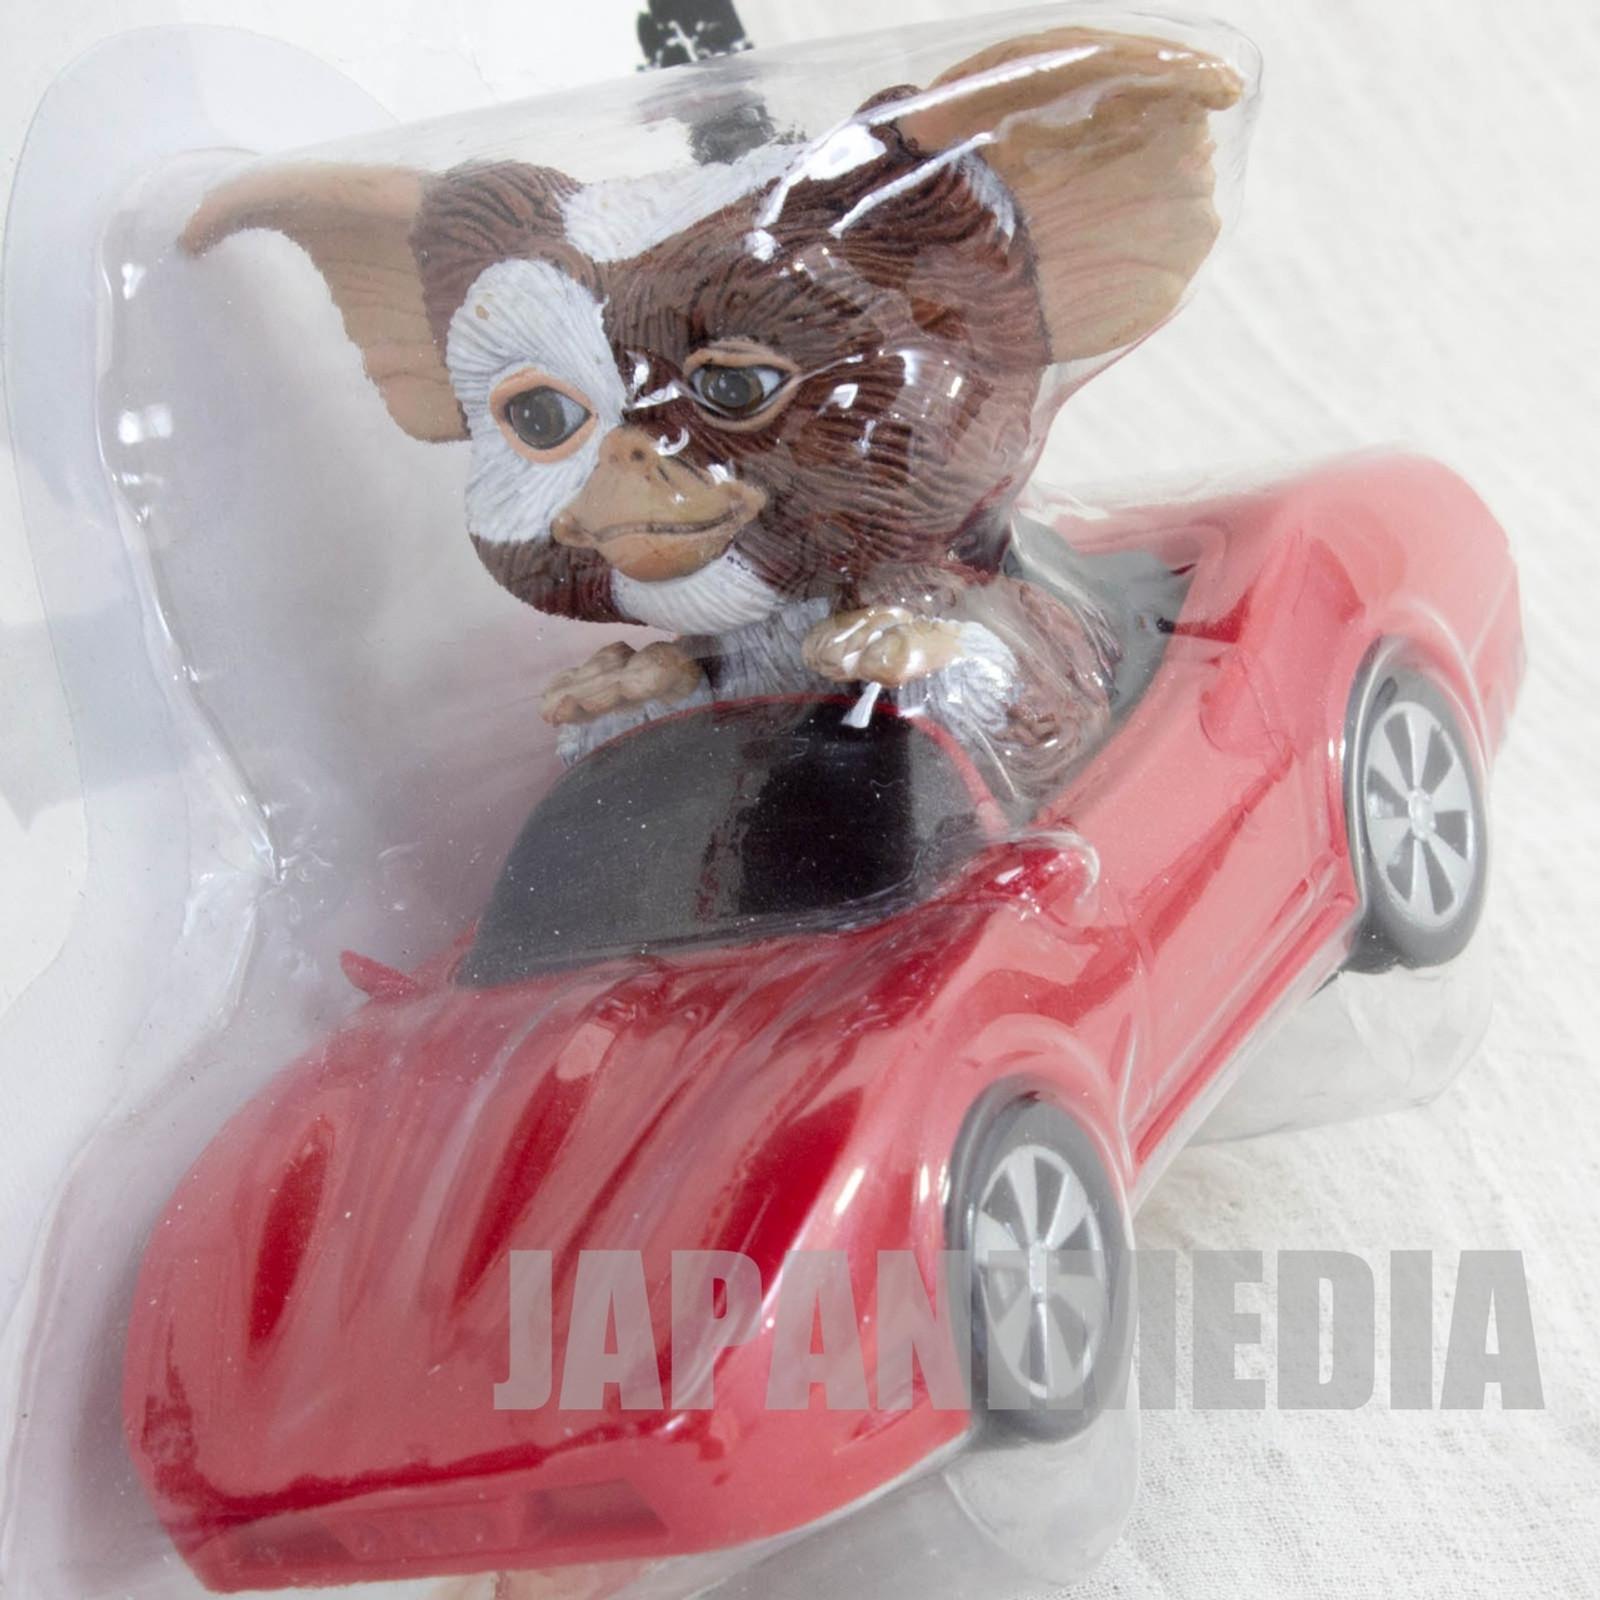 Gremlins Gizmo on Pull Back Action Car Figure NECA Reel Toys